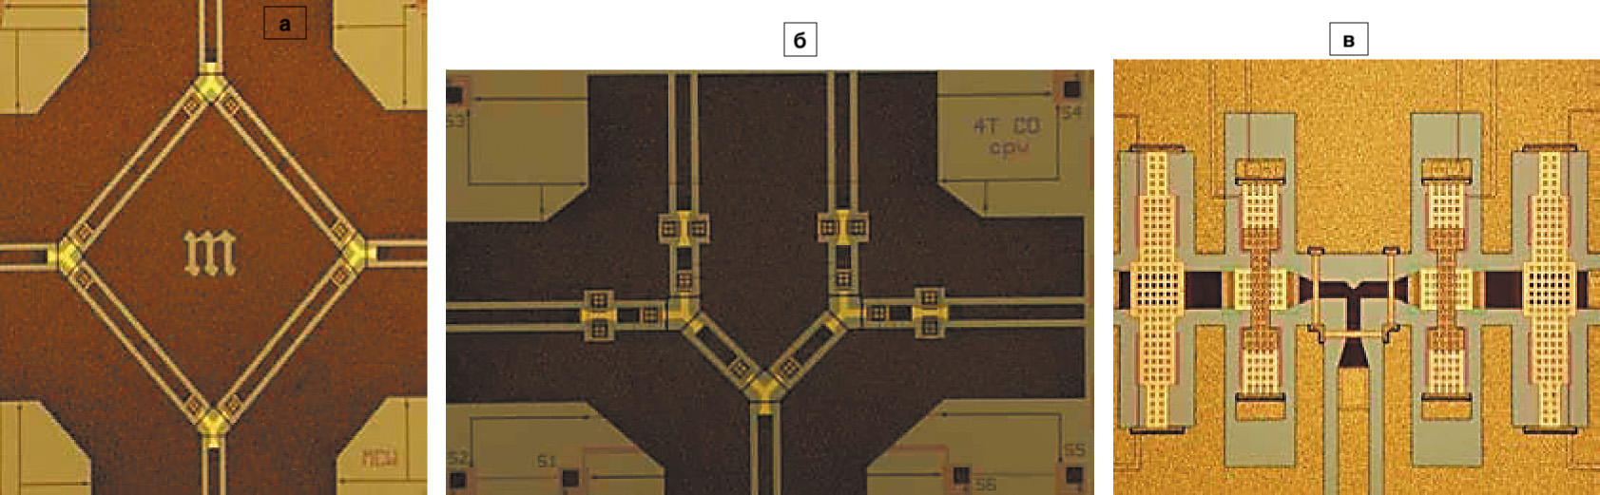 МЭМС-переключатели фирмы RF Microtech: а) DPDT; б) SP4T; в) SPDT